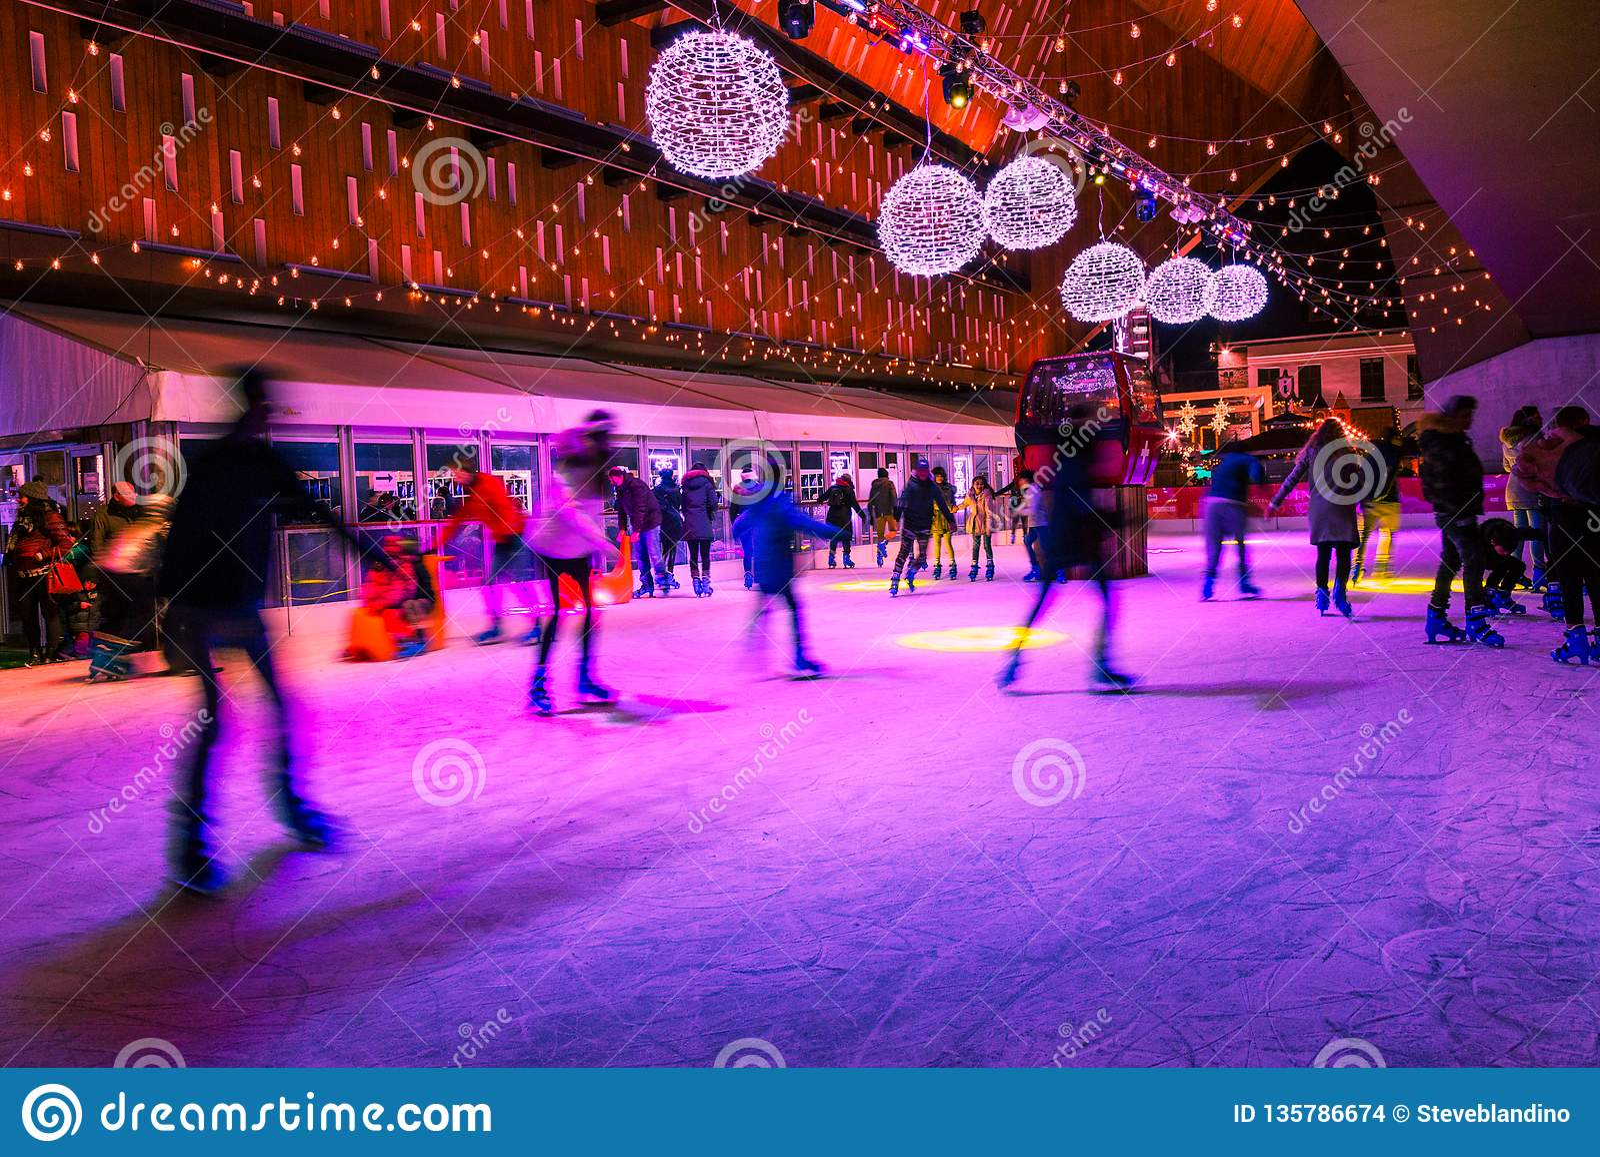 Ghent ice-skating rink